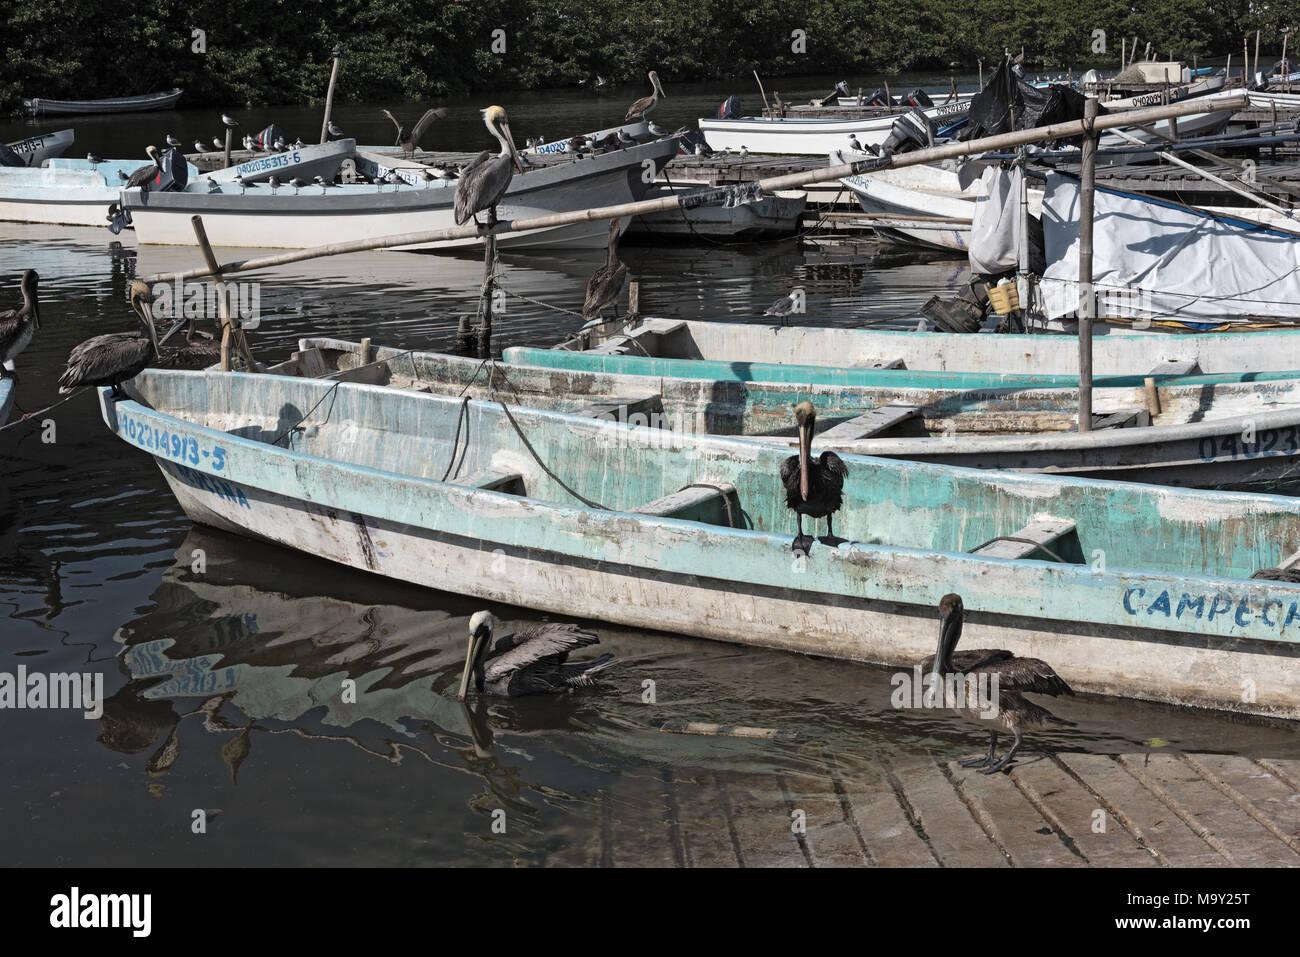 Fishing boats in the darsena de san francisco, Campeche, Mexico - Stock Image